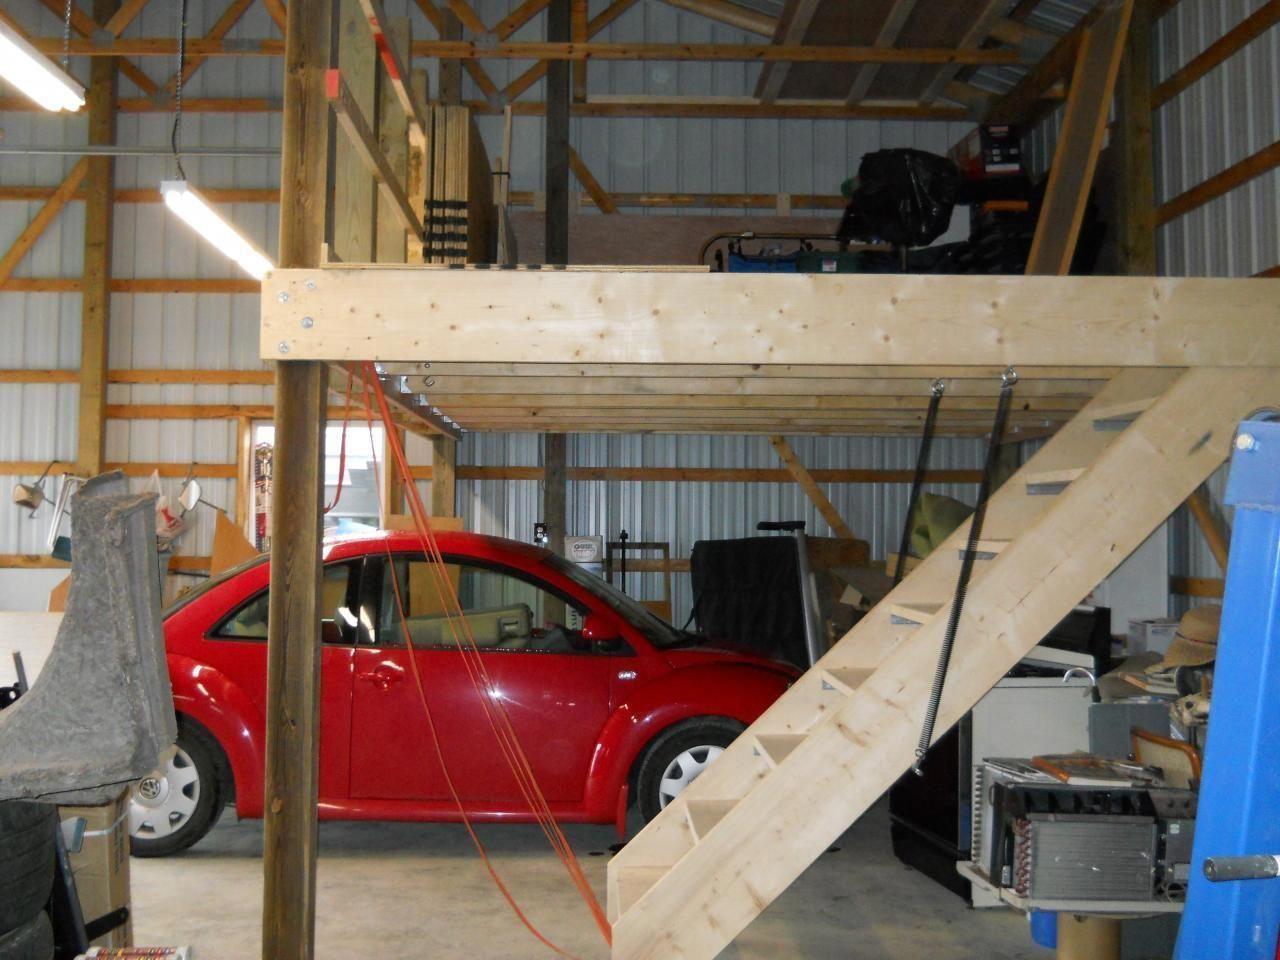 Attic Bathroom Shiplap Walkupatticrenovation Atticbathroomtile Atticrenovationbedroom Garage Attic Attic Flooring Garage Loft